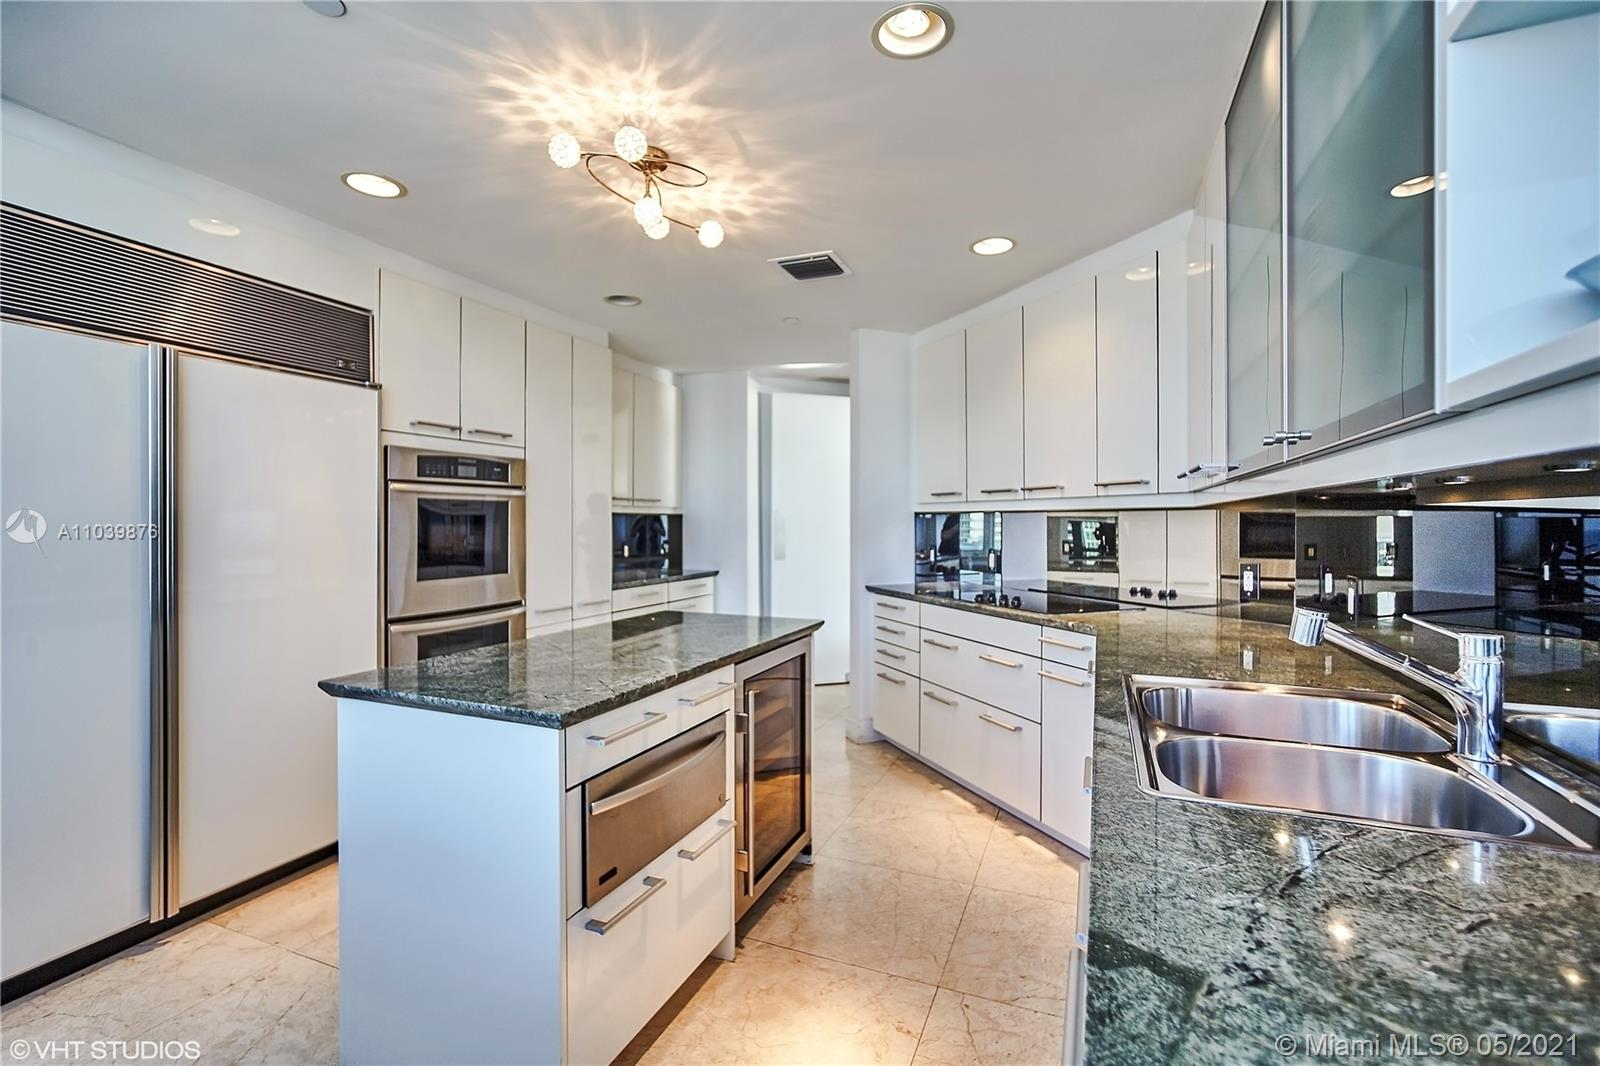 Photo of 10225 Collins Ave #1703, Bal Harbour, Florida, 33154 - Dine-in kitchen/breakfast area overlooking the Intracoastal Waterway, Haulover Sandbar and Atlantic Ocean.